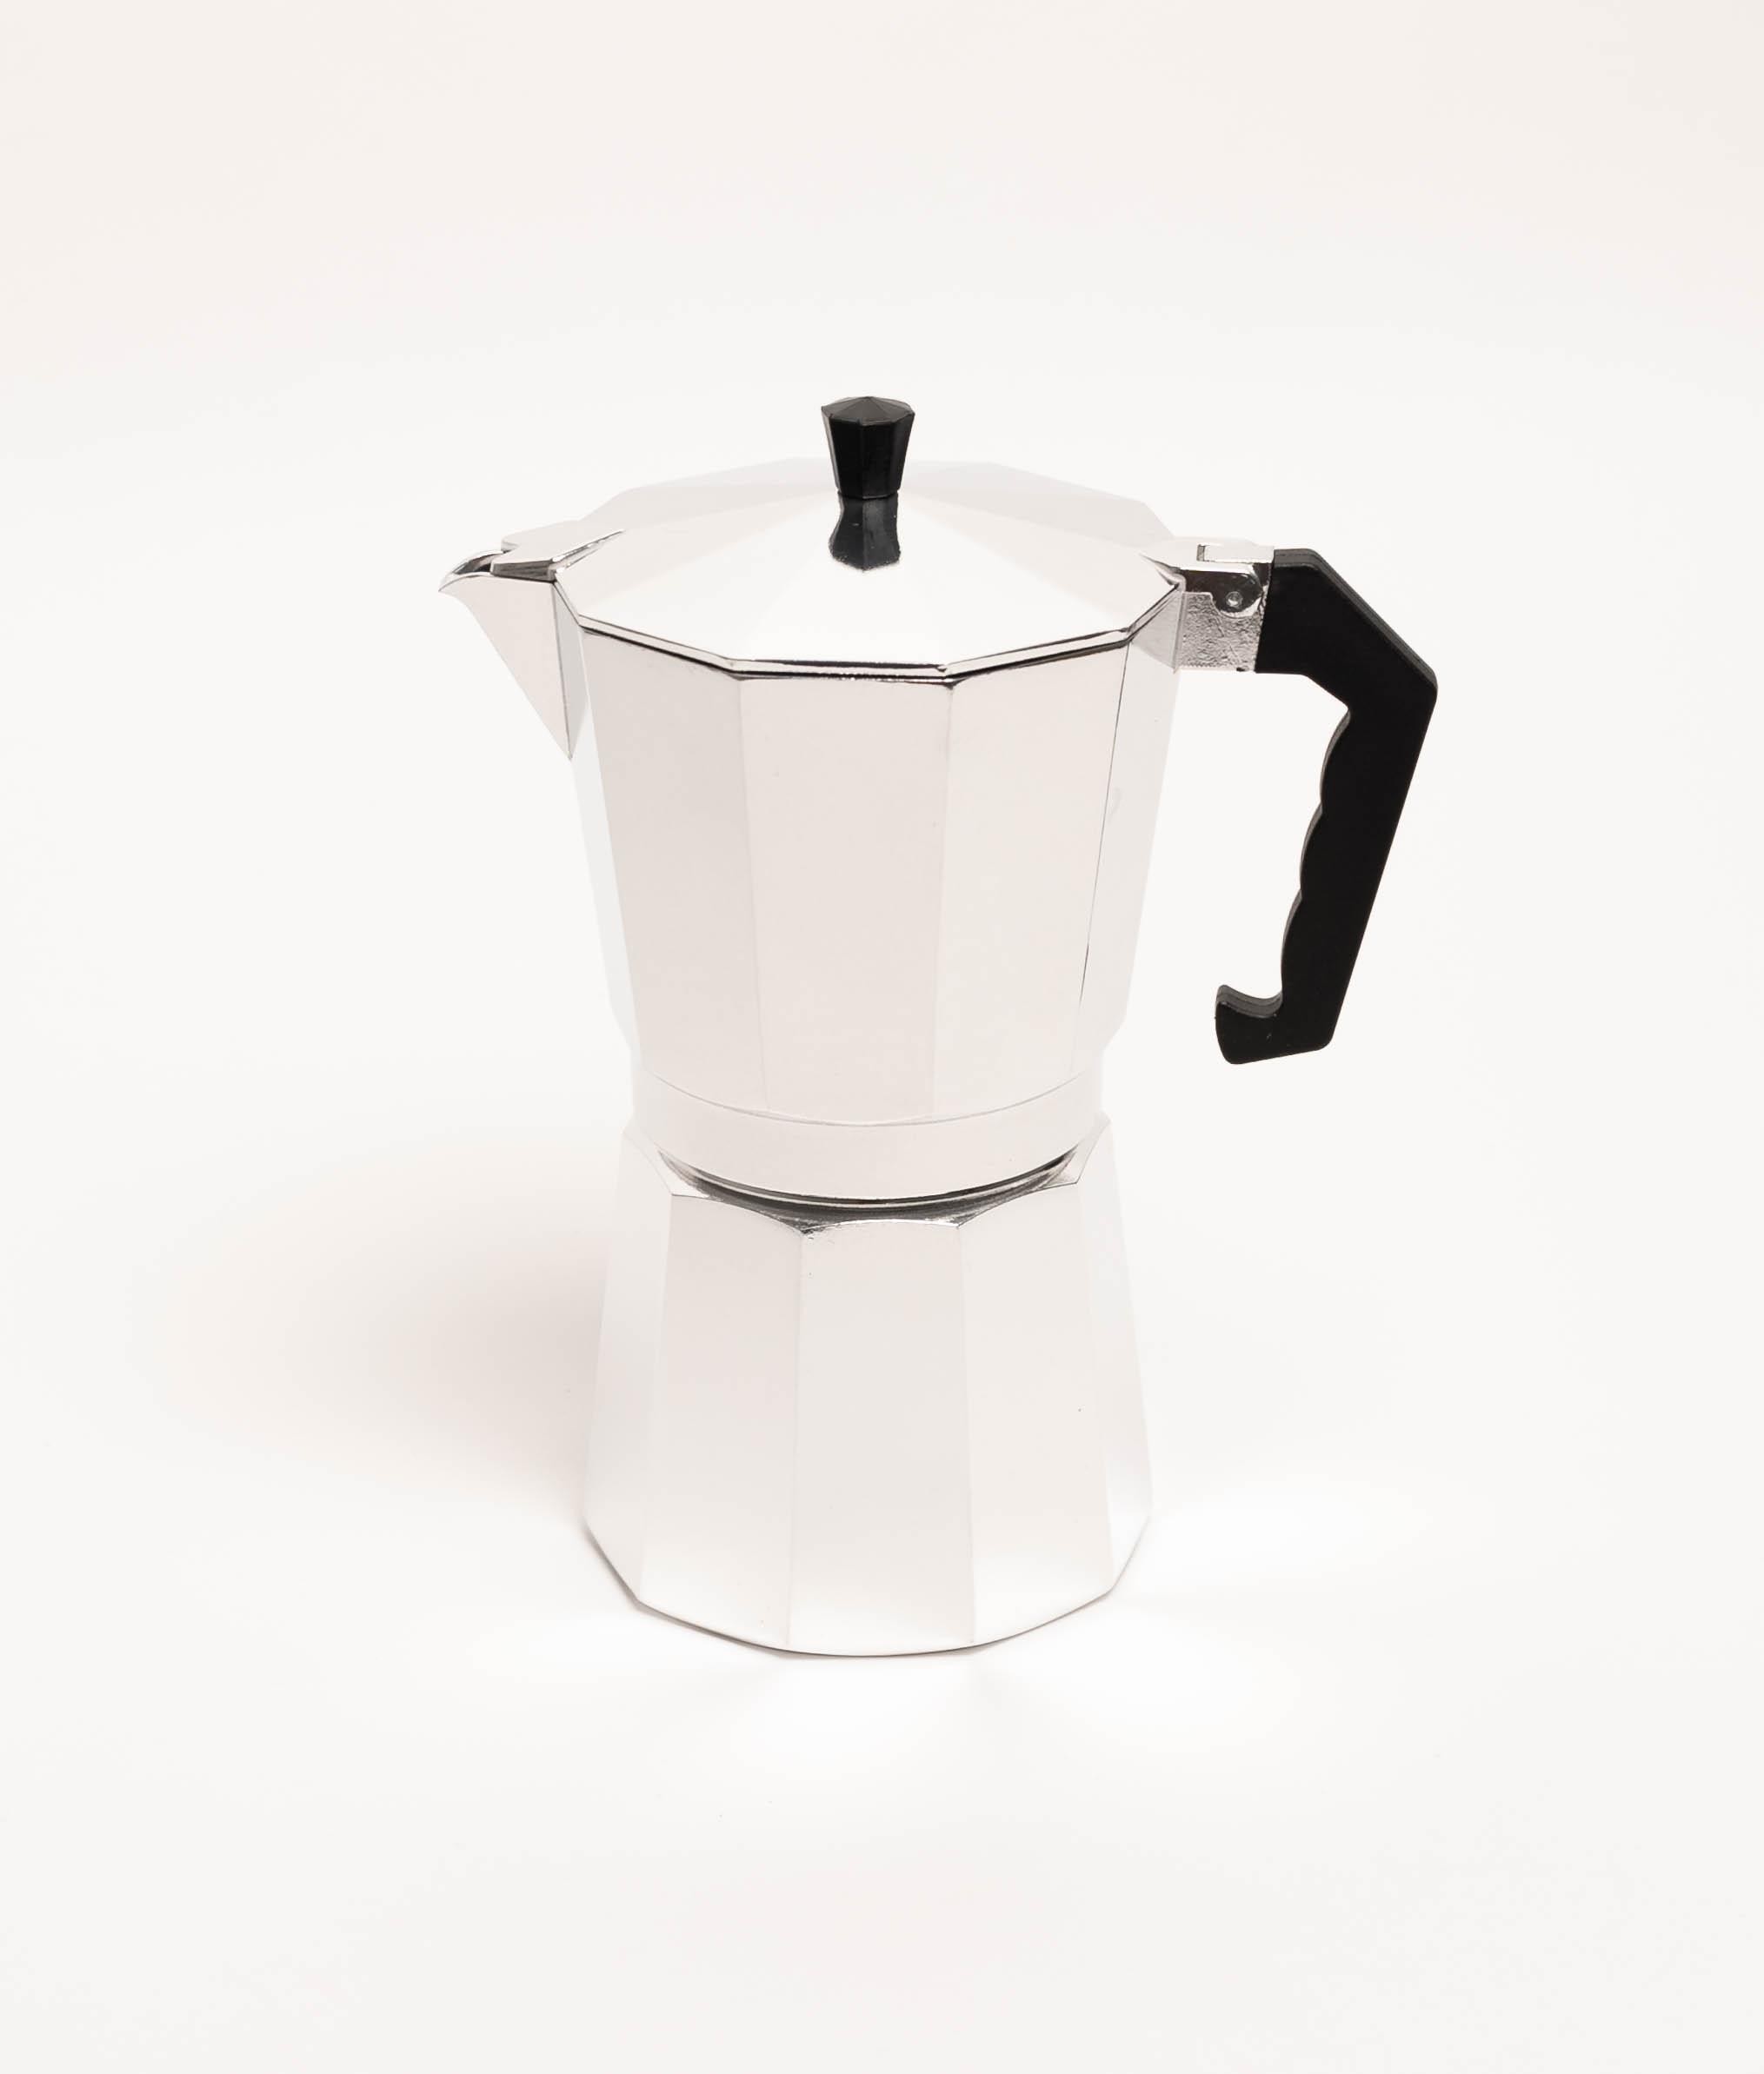 CAFETERA MAKER - PLATA